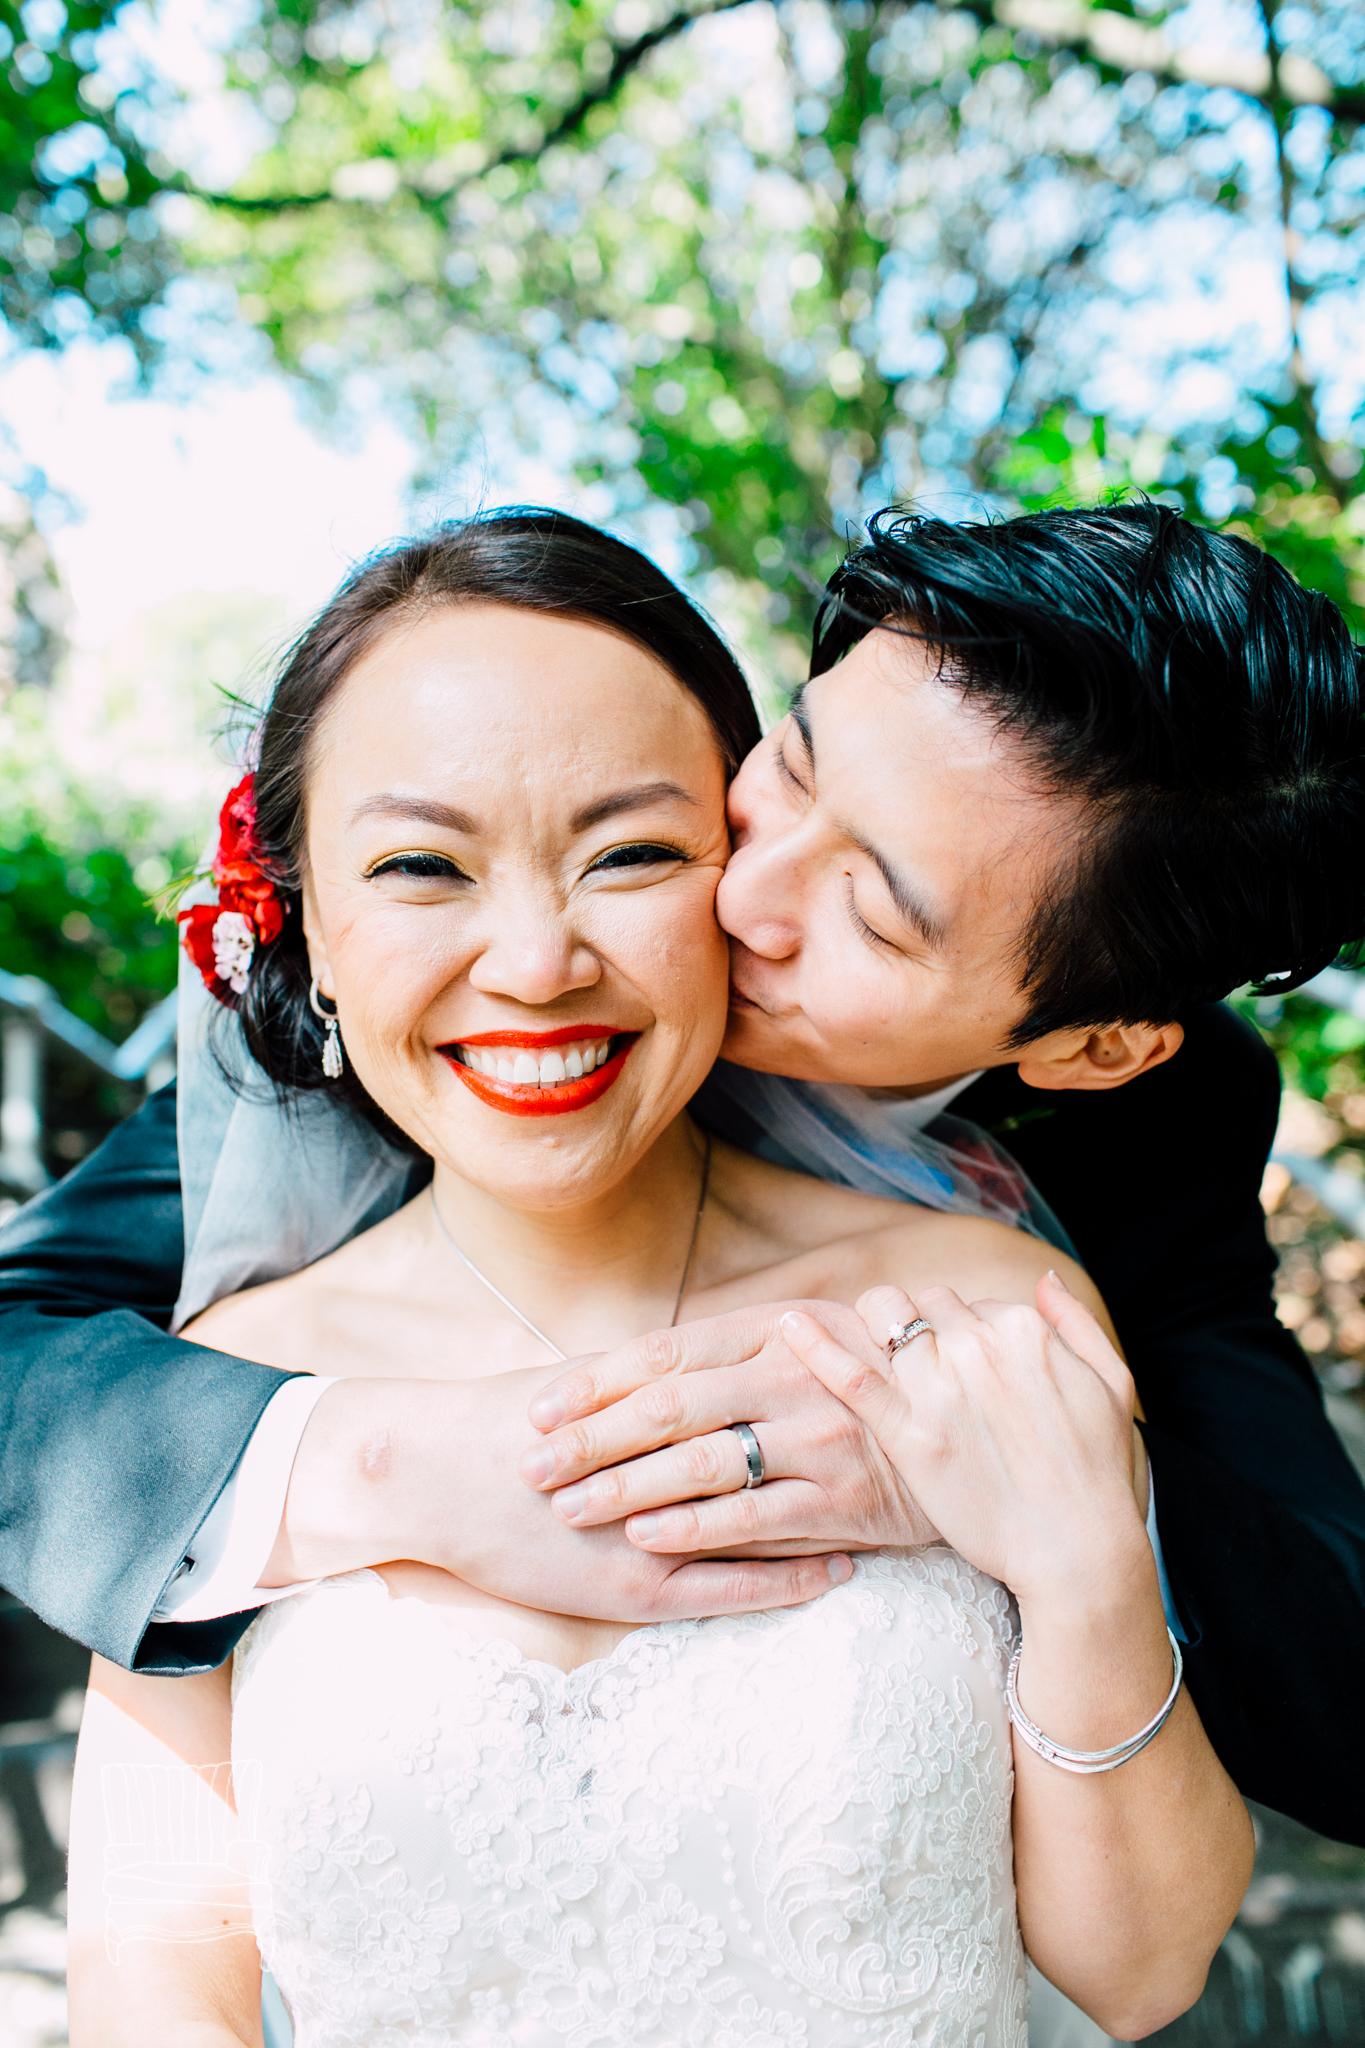 seattle-kerry-park-wedding-katheryn-moran-photography-yovithomas-1-2.JPG